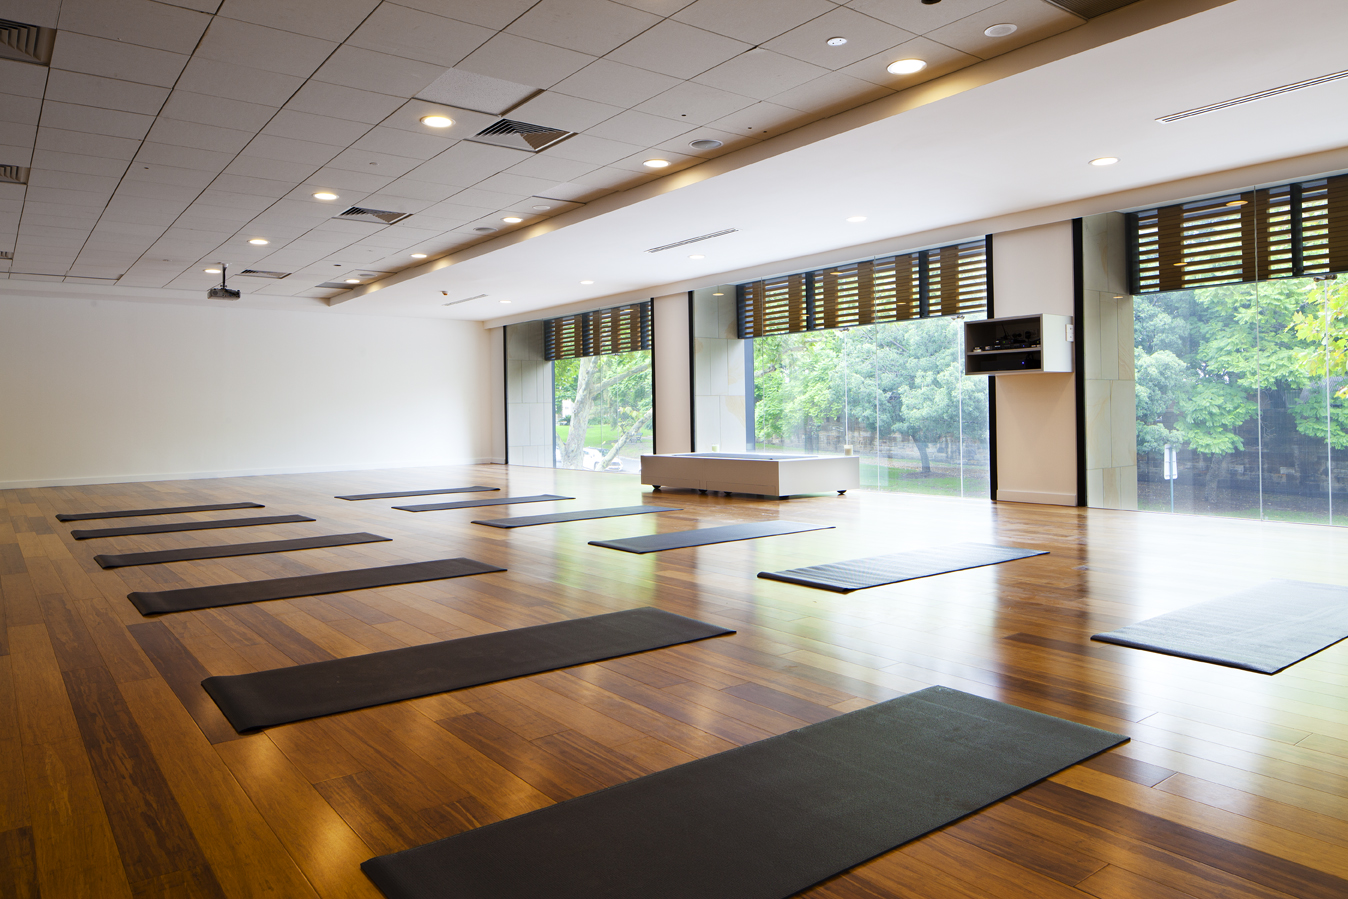 FLOW_ATHLETIC_Venue-Hire-Yoga-Studio